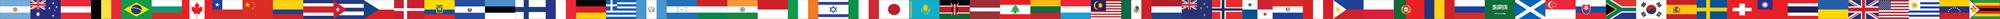 Patagonia World Marathon Flags